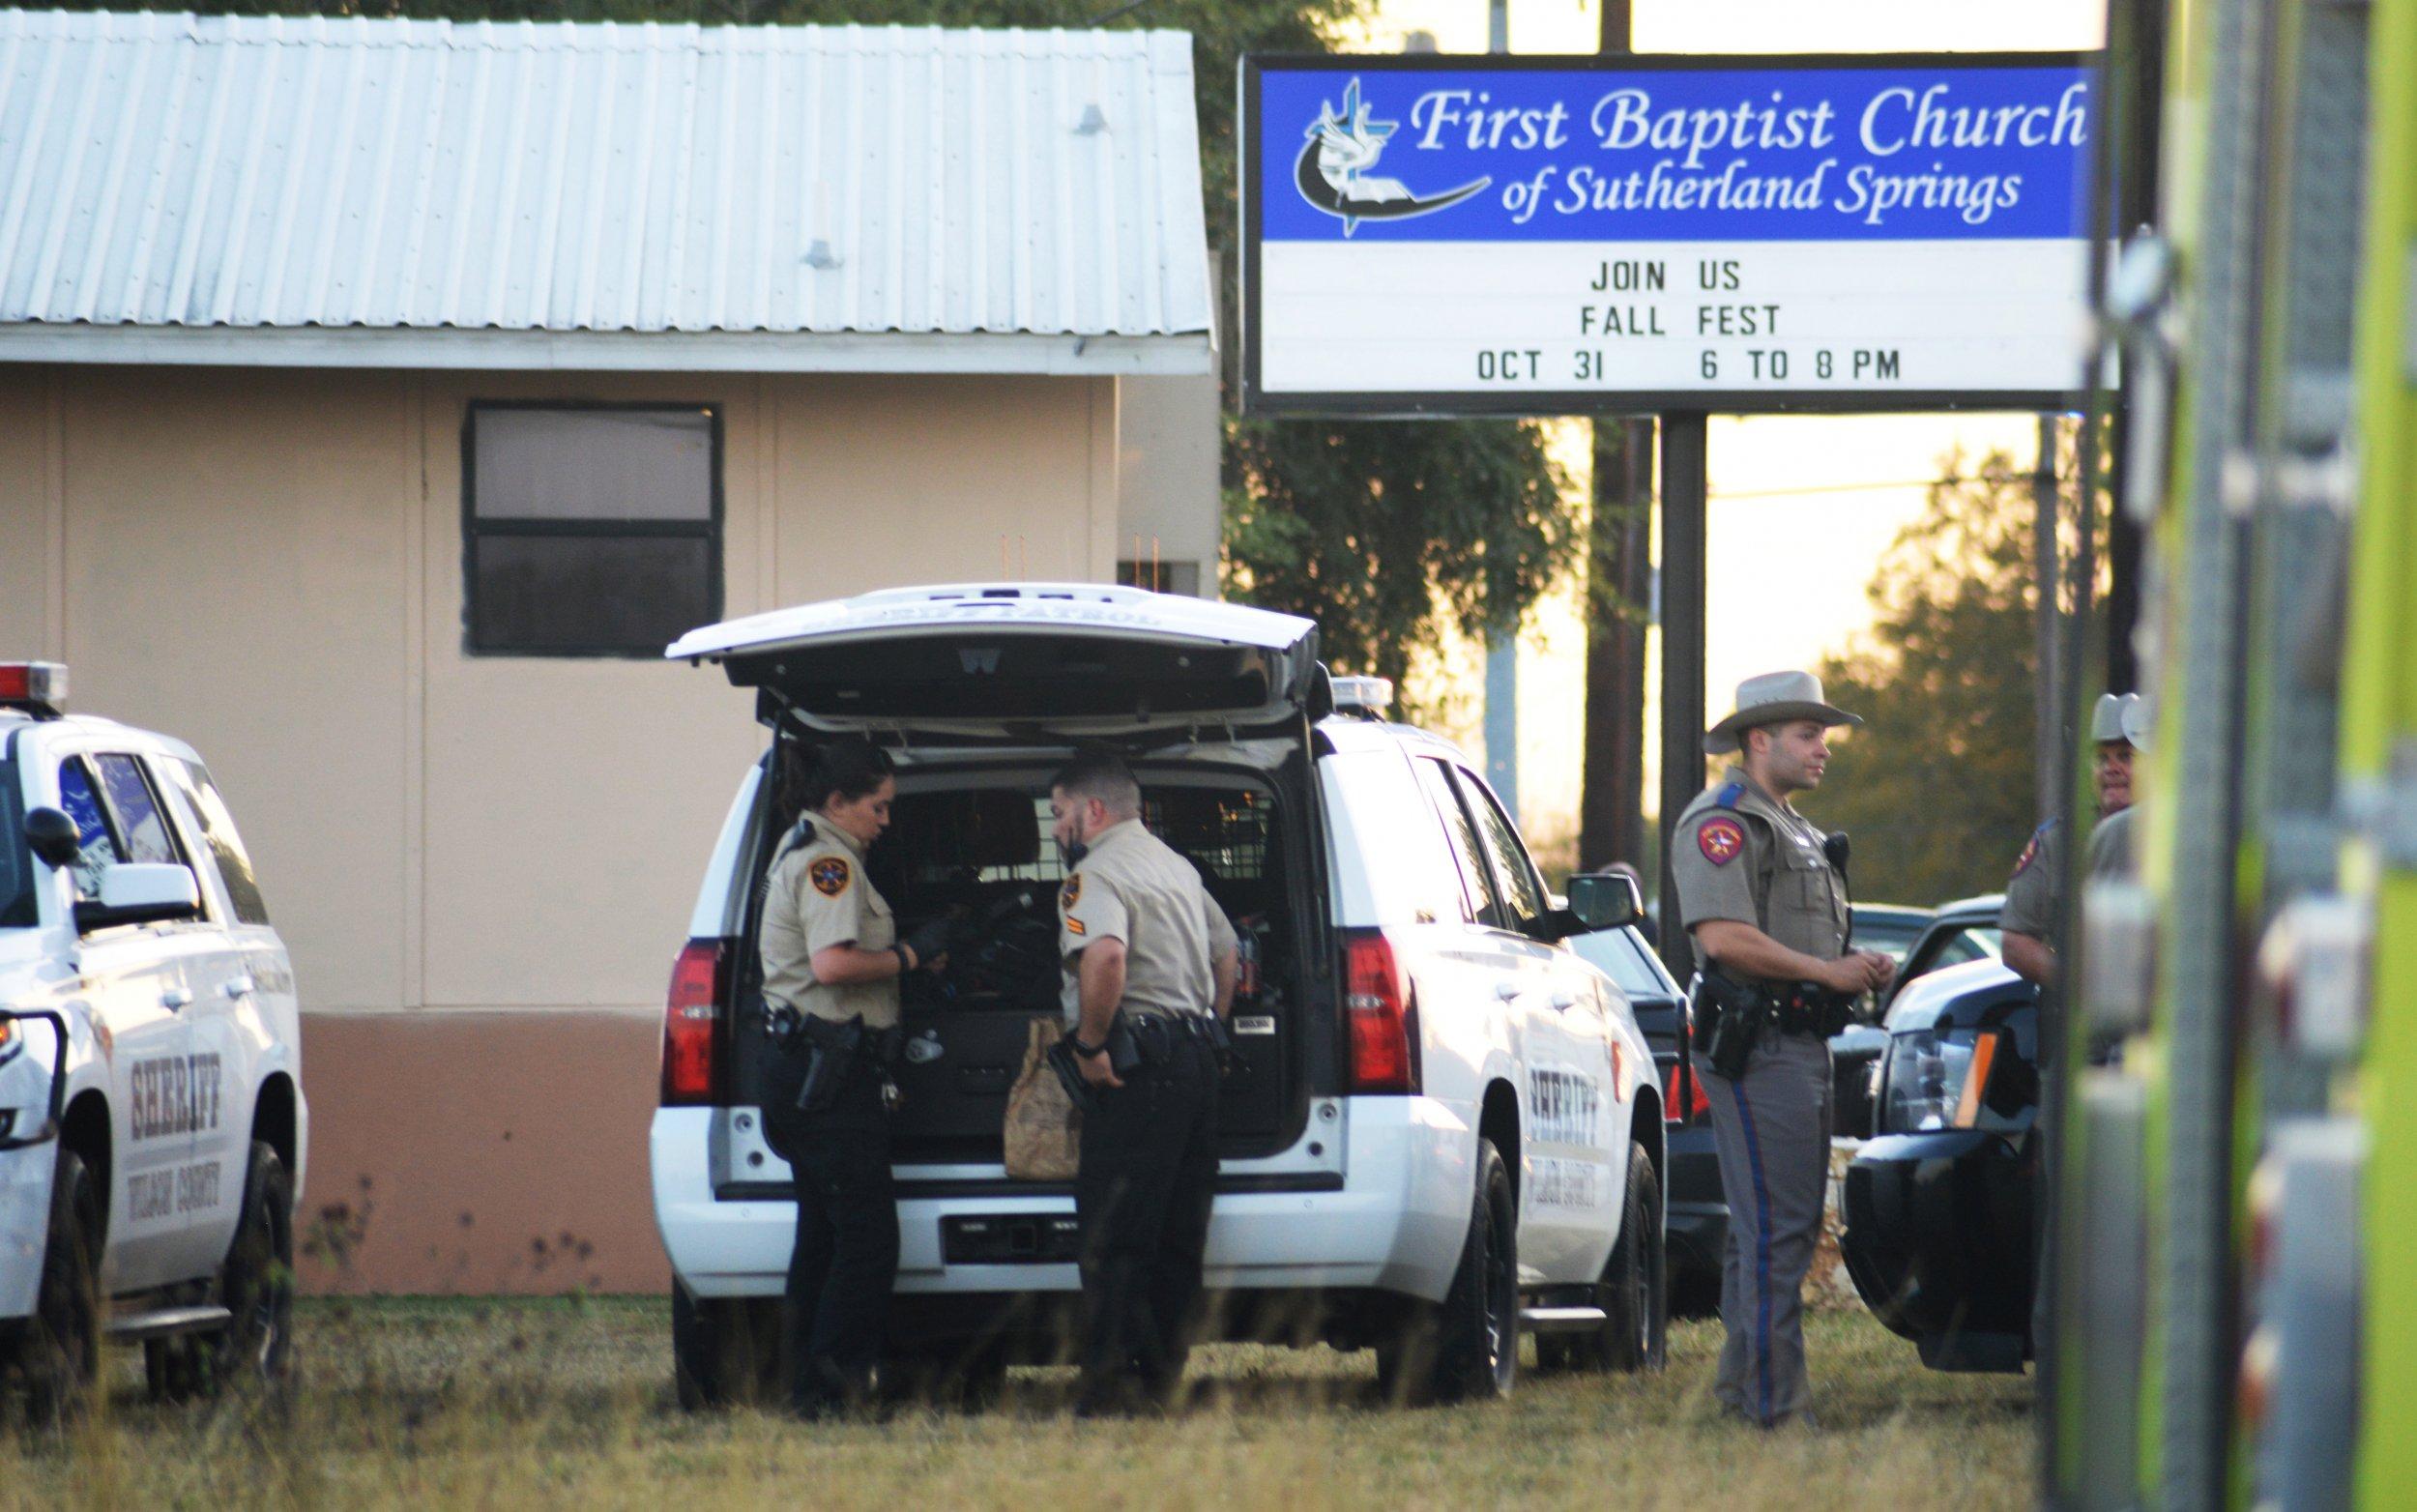 Former Air Force member kills dozens in Texas baptist church shooting